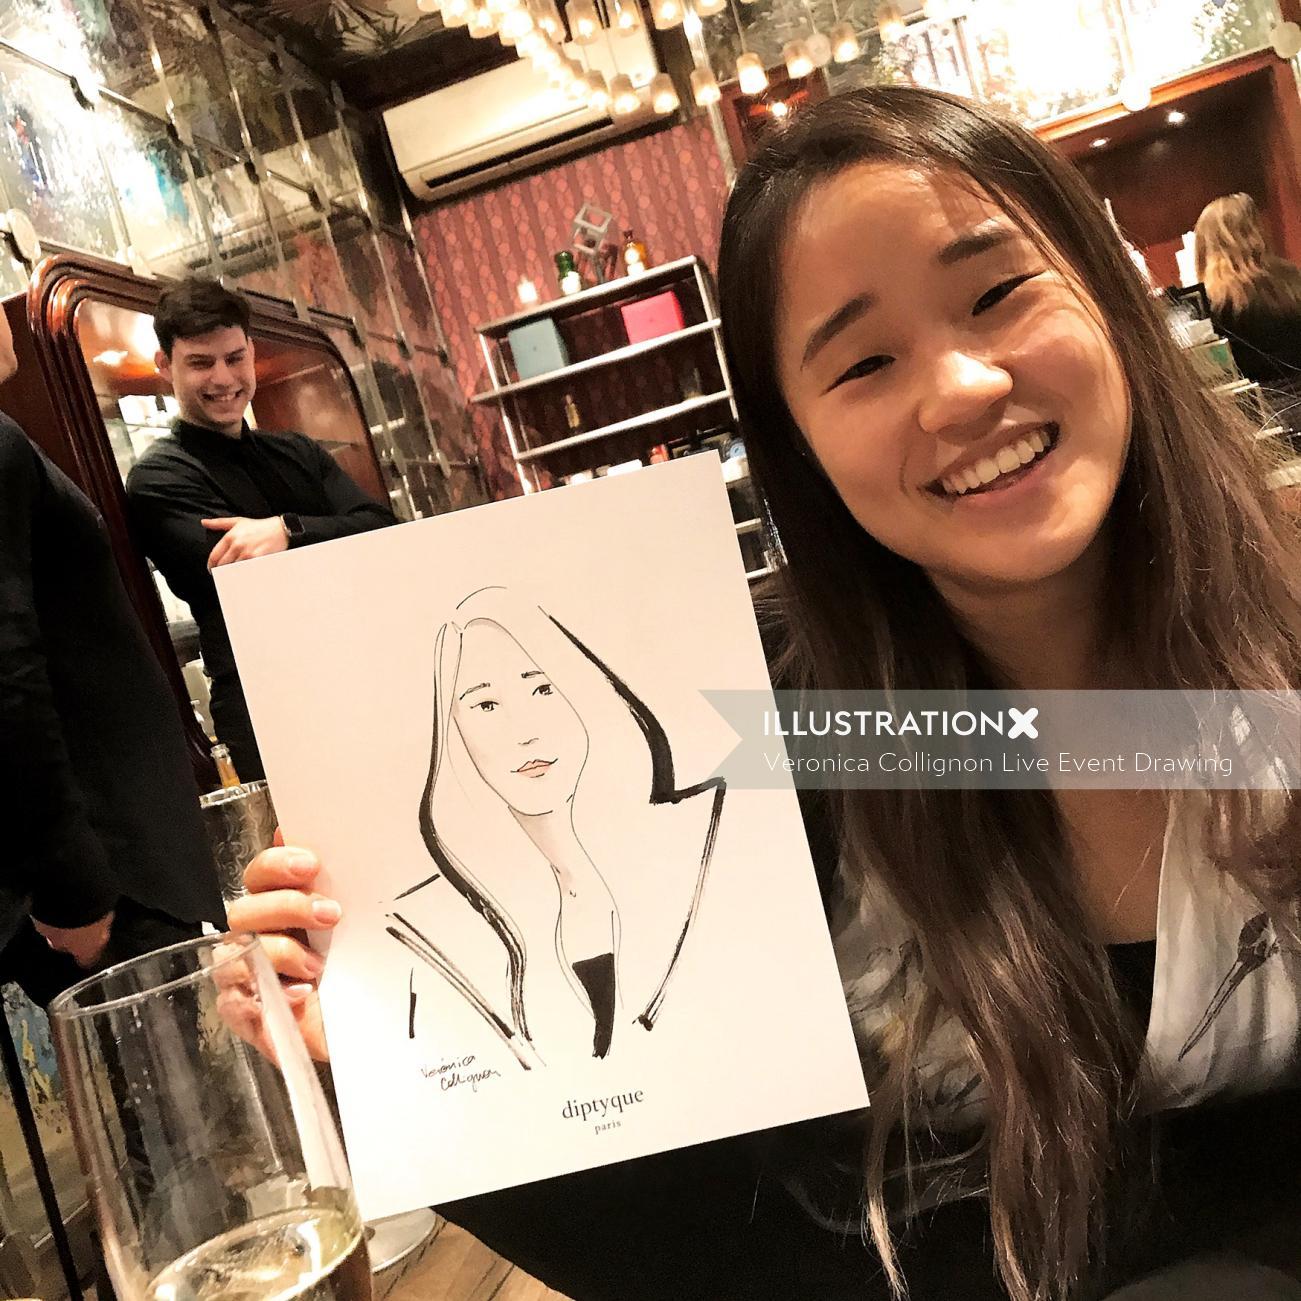 Live event drawing teenage girl